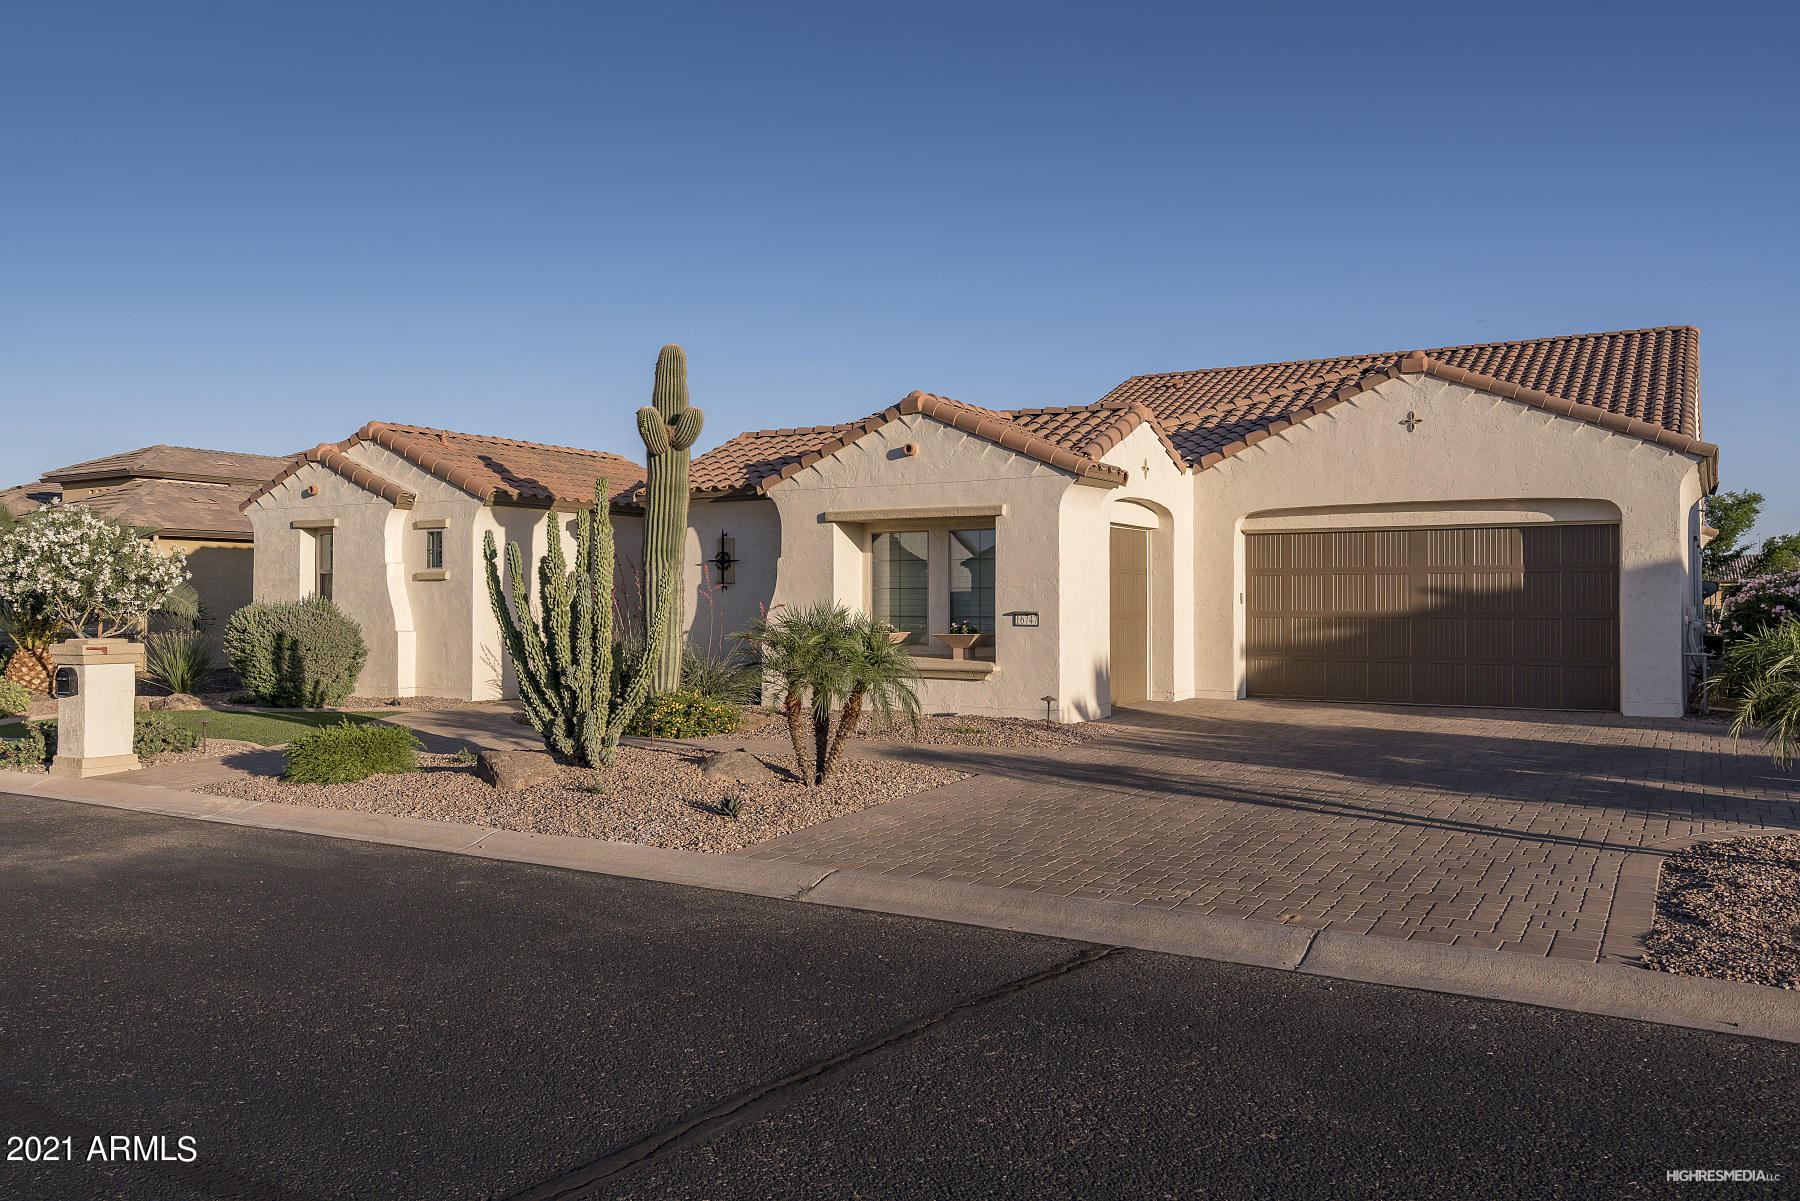 Photo of 16747 W HOLLY Street, Goodyear, AZ 85395 (MLS # 6231886)